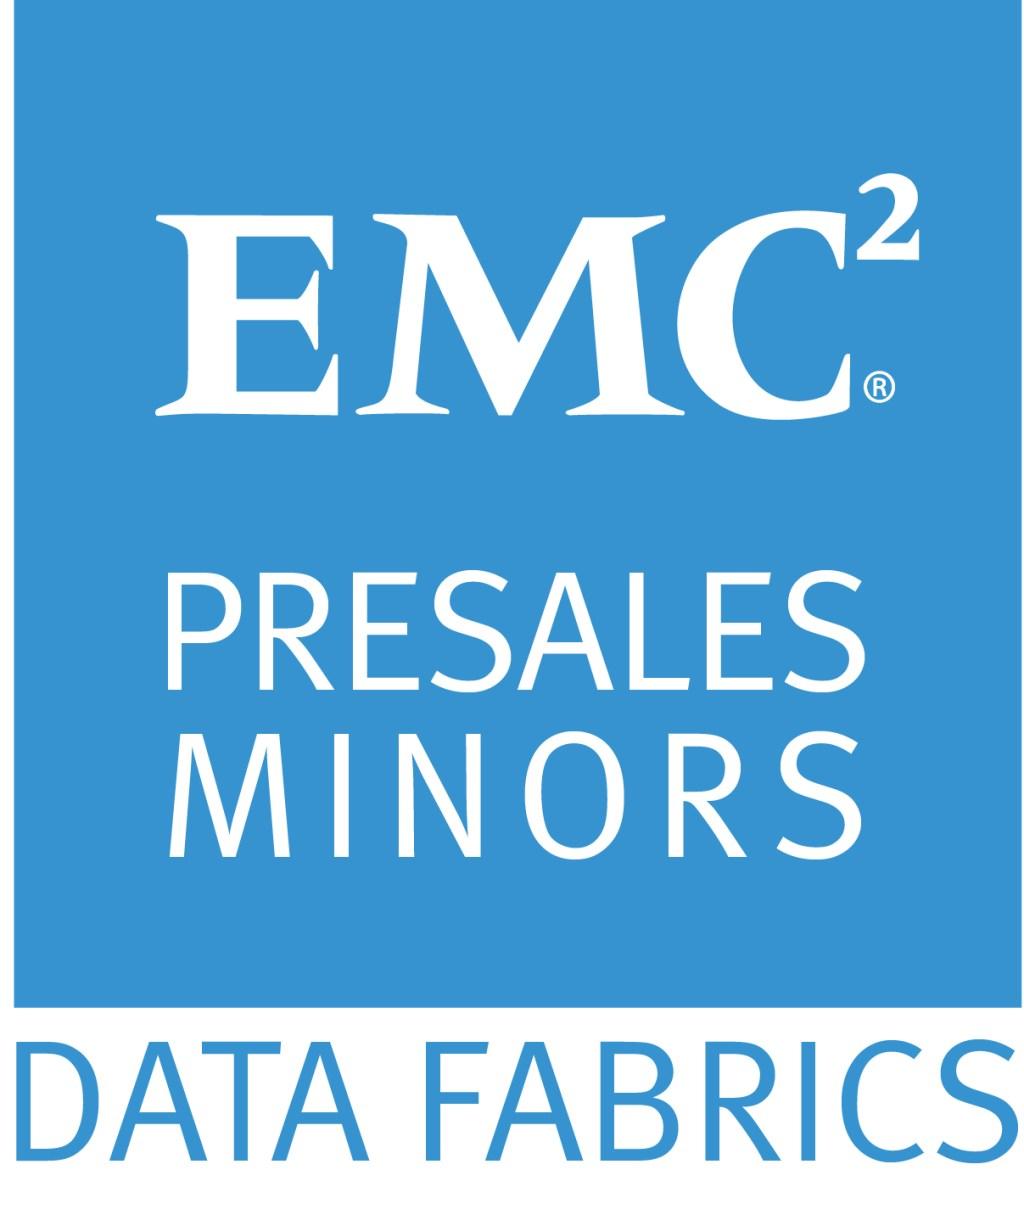 Bearded Editorial – EMC SE Forum 2015 – Data Fabrics Minor Tech Sessions